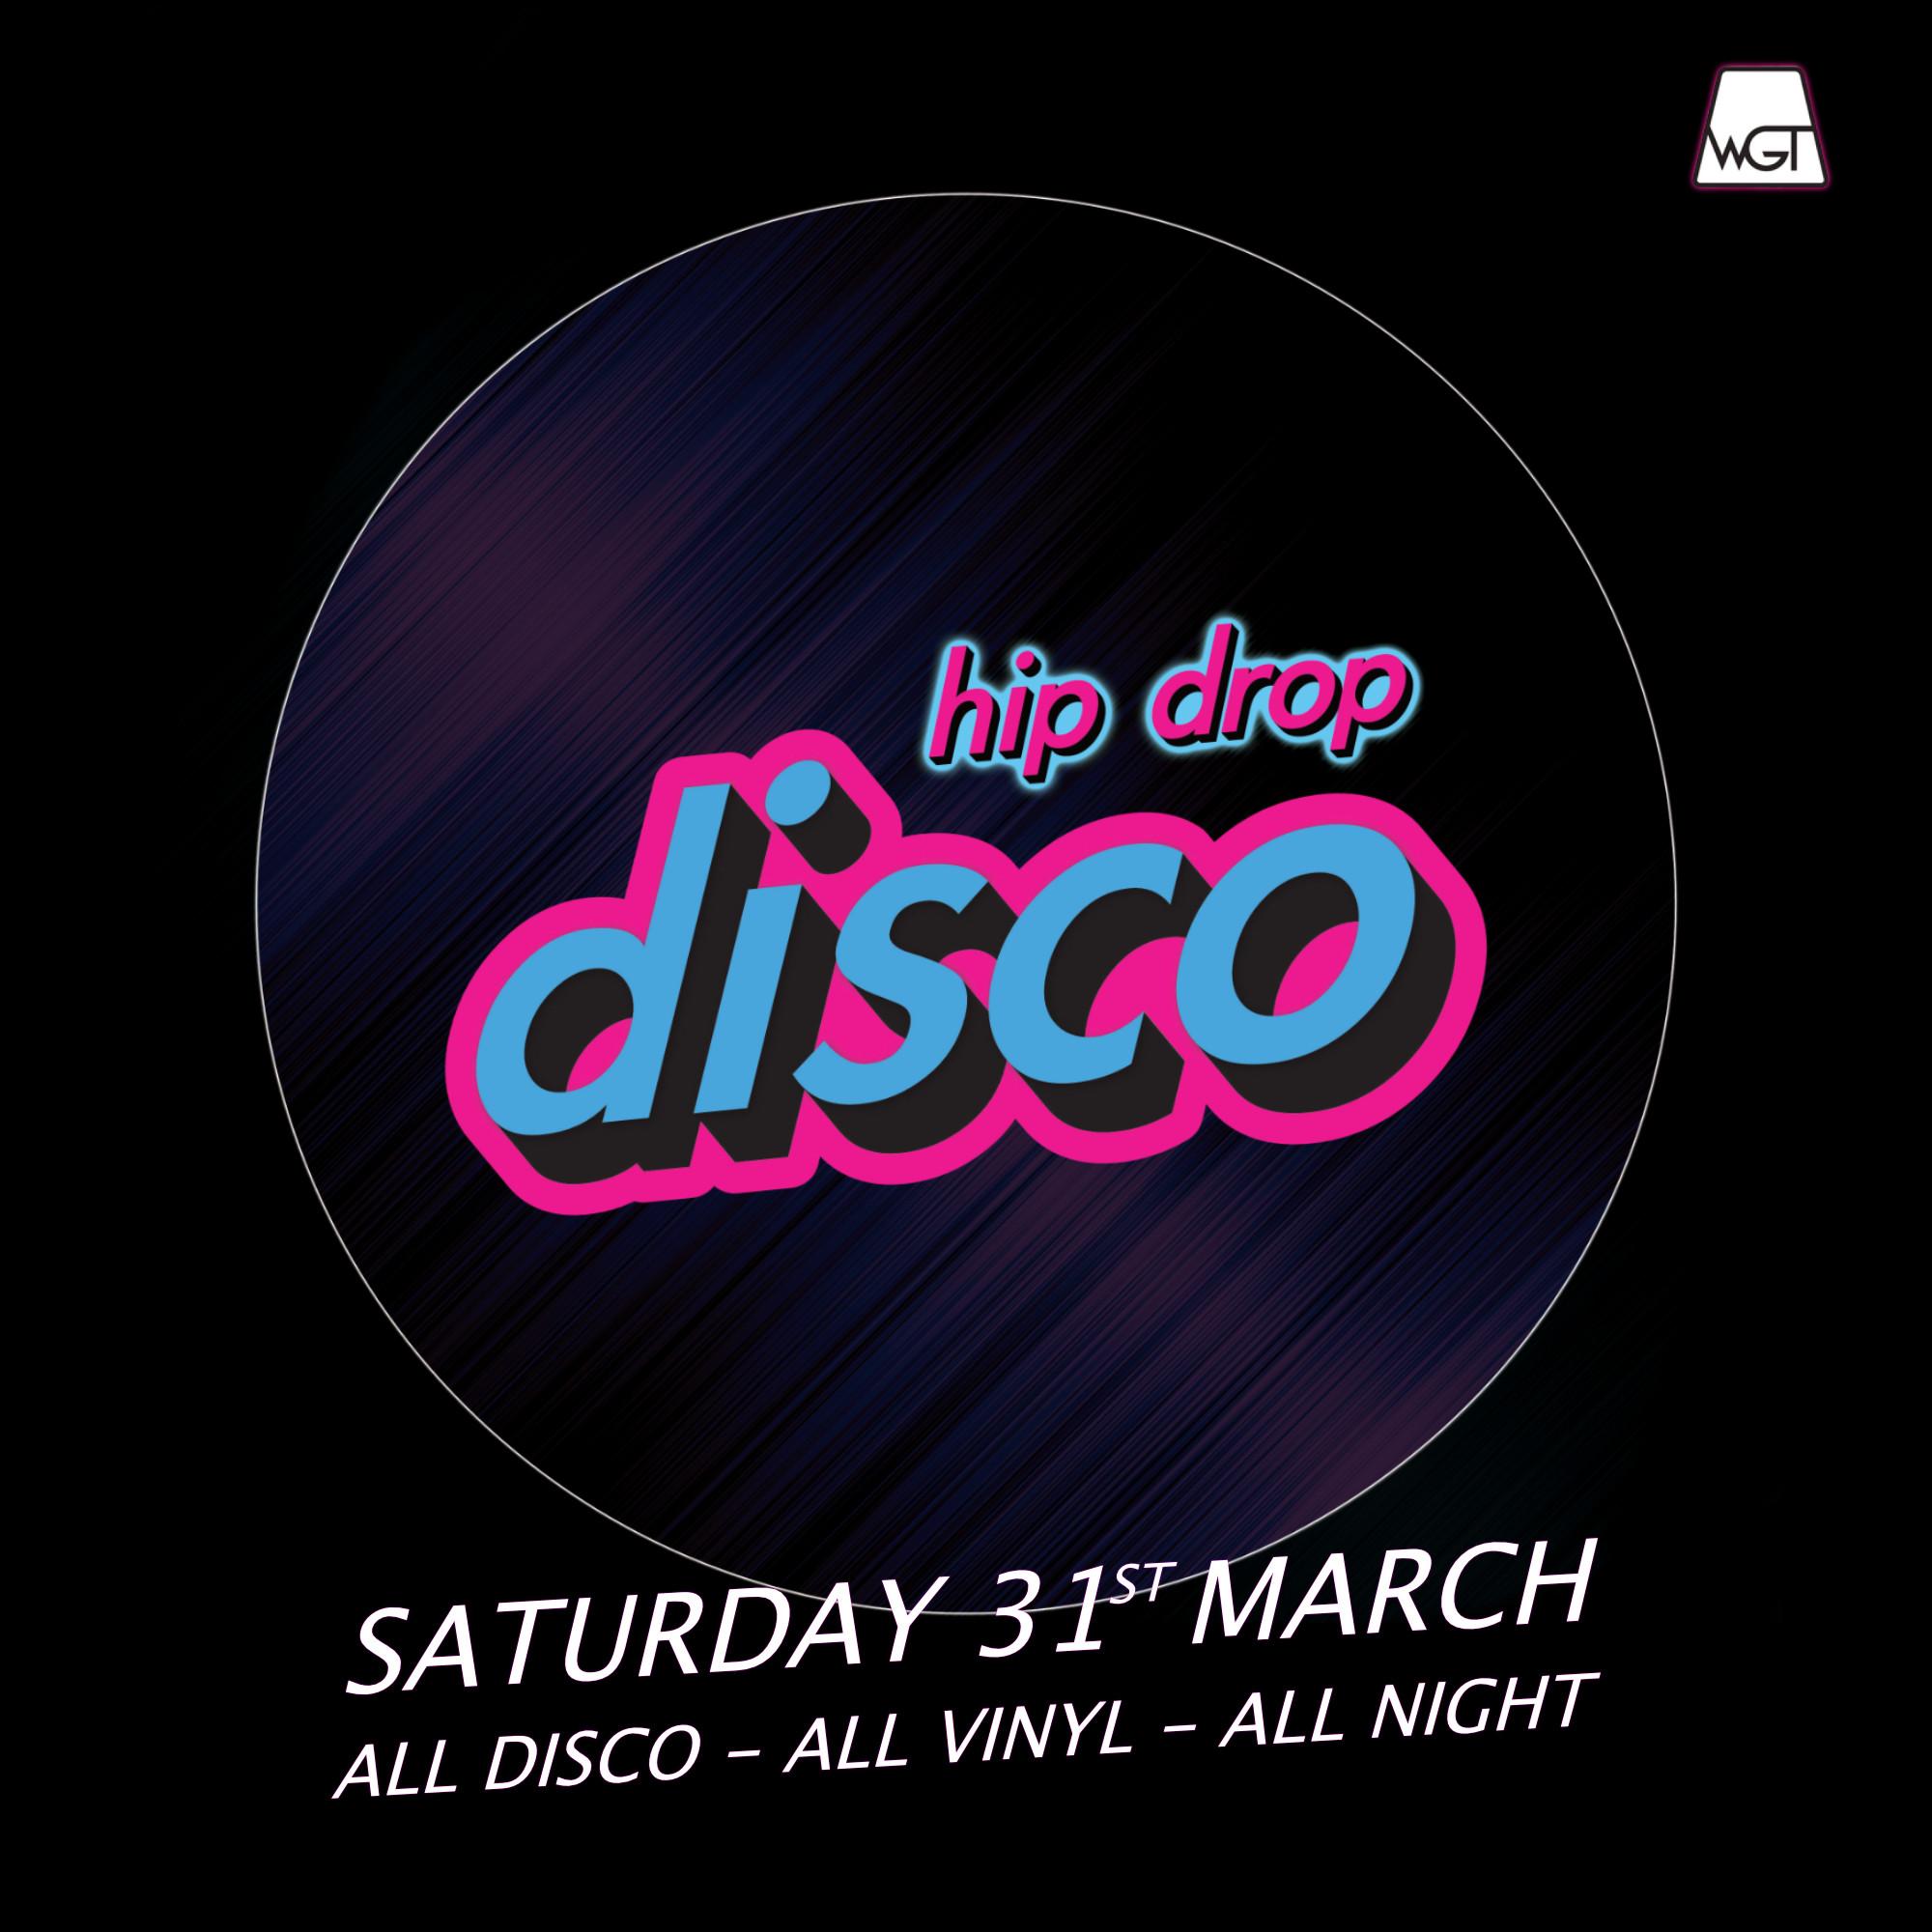 wgt hipdropsdisco march SQ.jpg